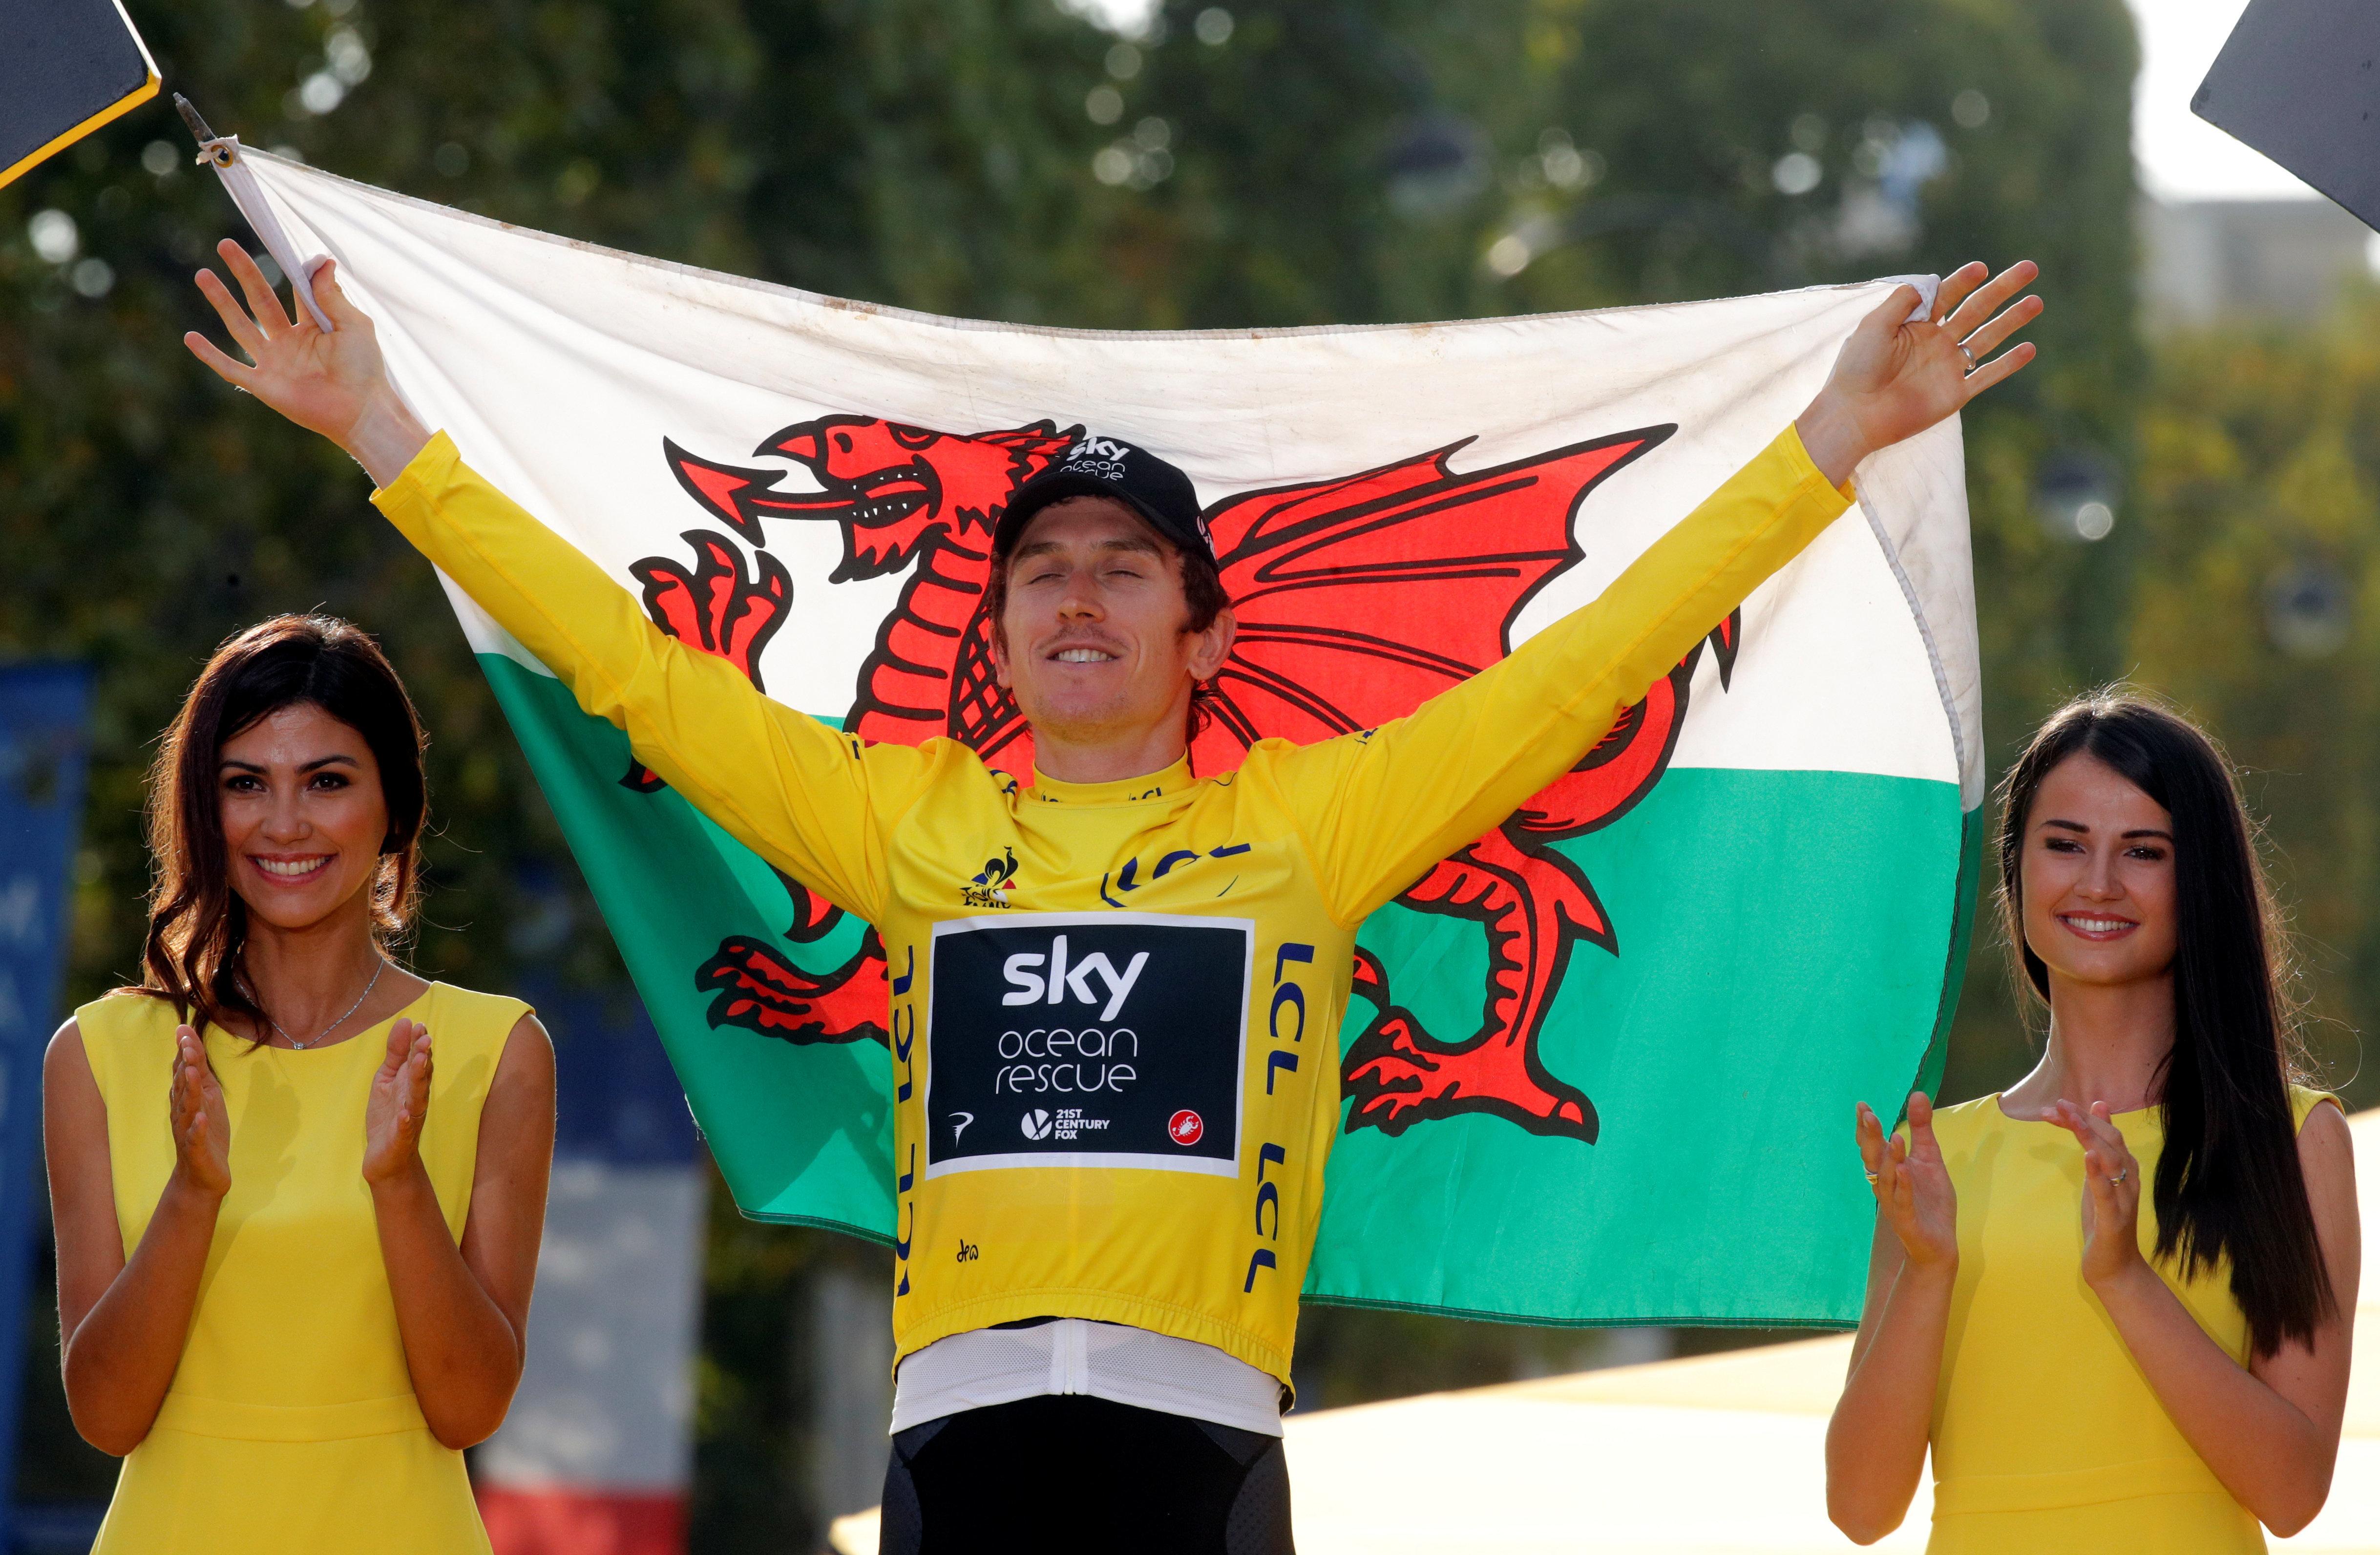 Welsh Rider Geraint Thomas Wins First Tour De France